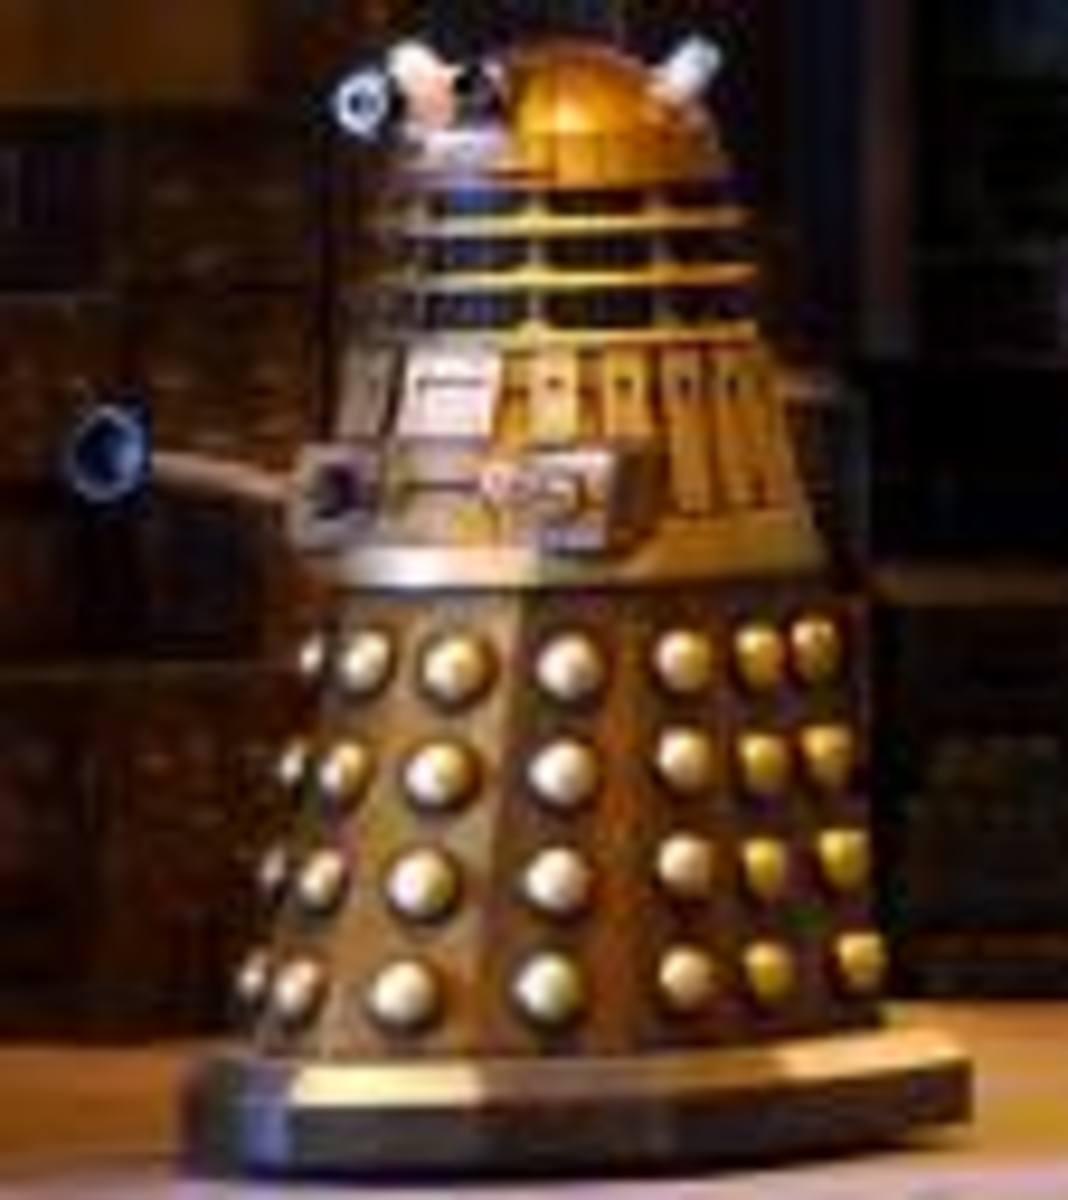 The image of a true Dalek...exterminate!!